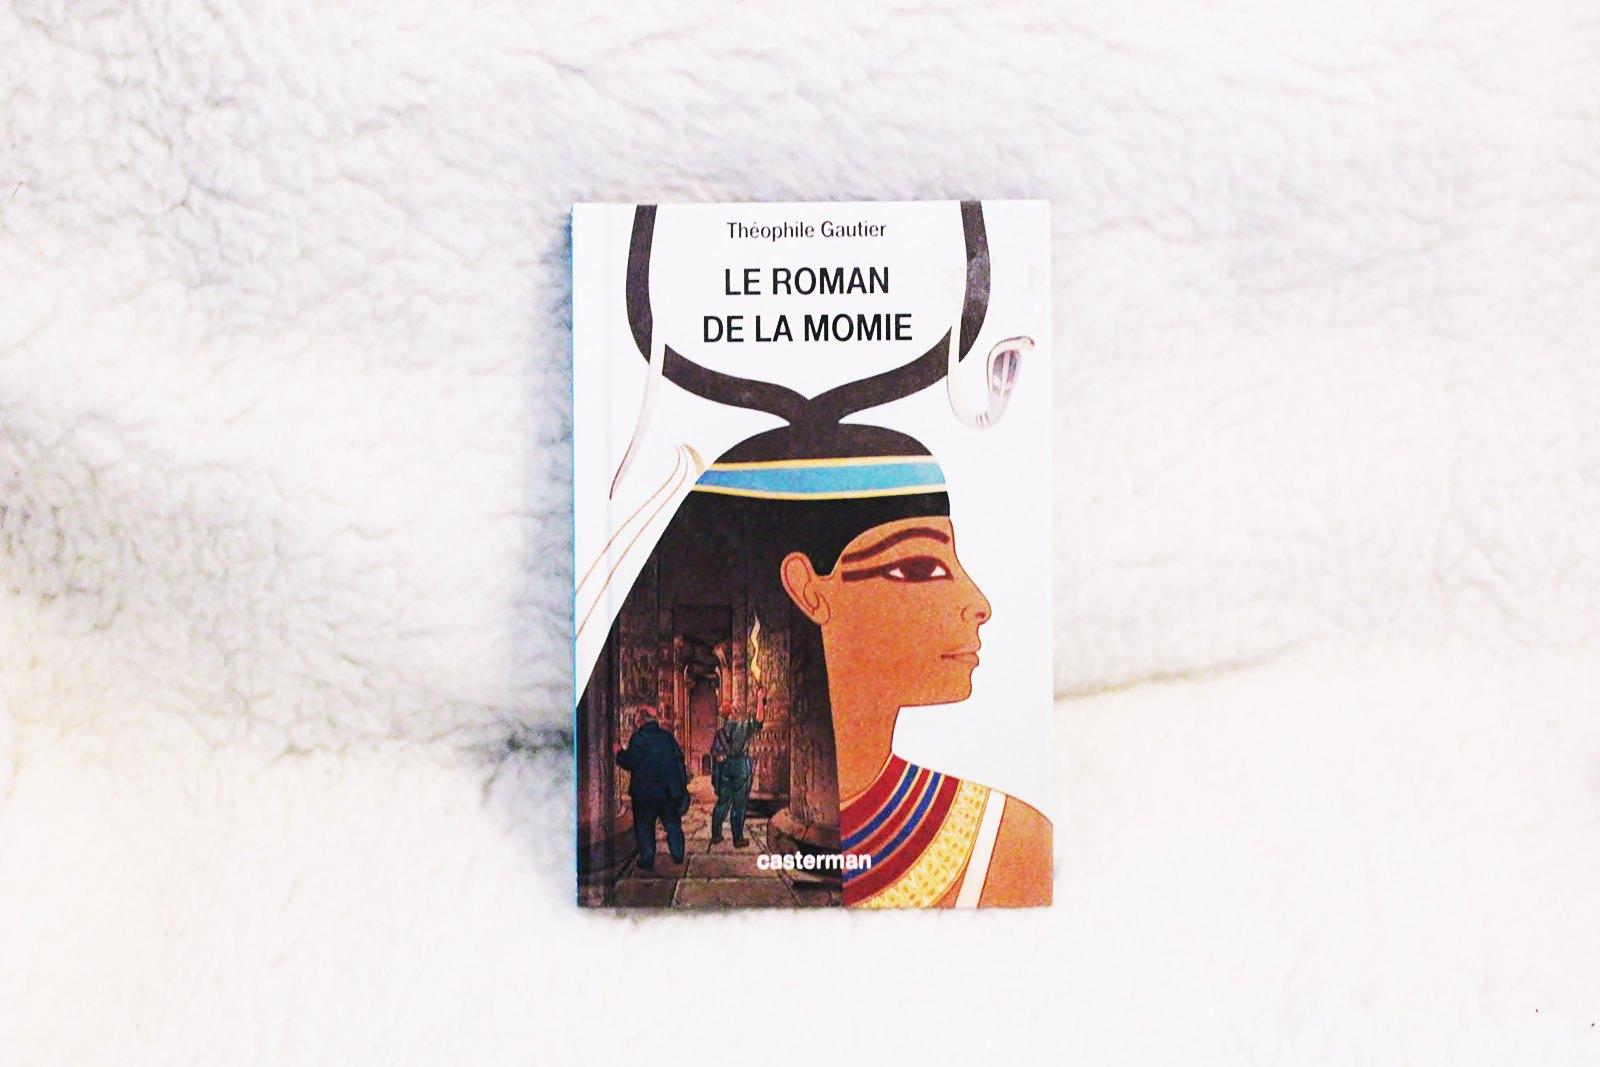 Living book livre vivant charlotte mason ecole a la maison ief 2